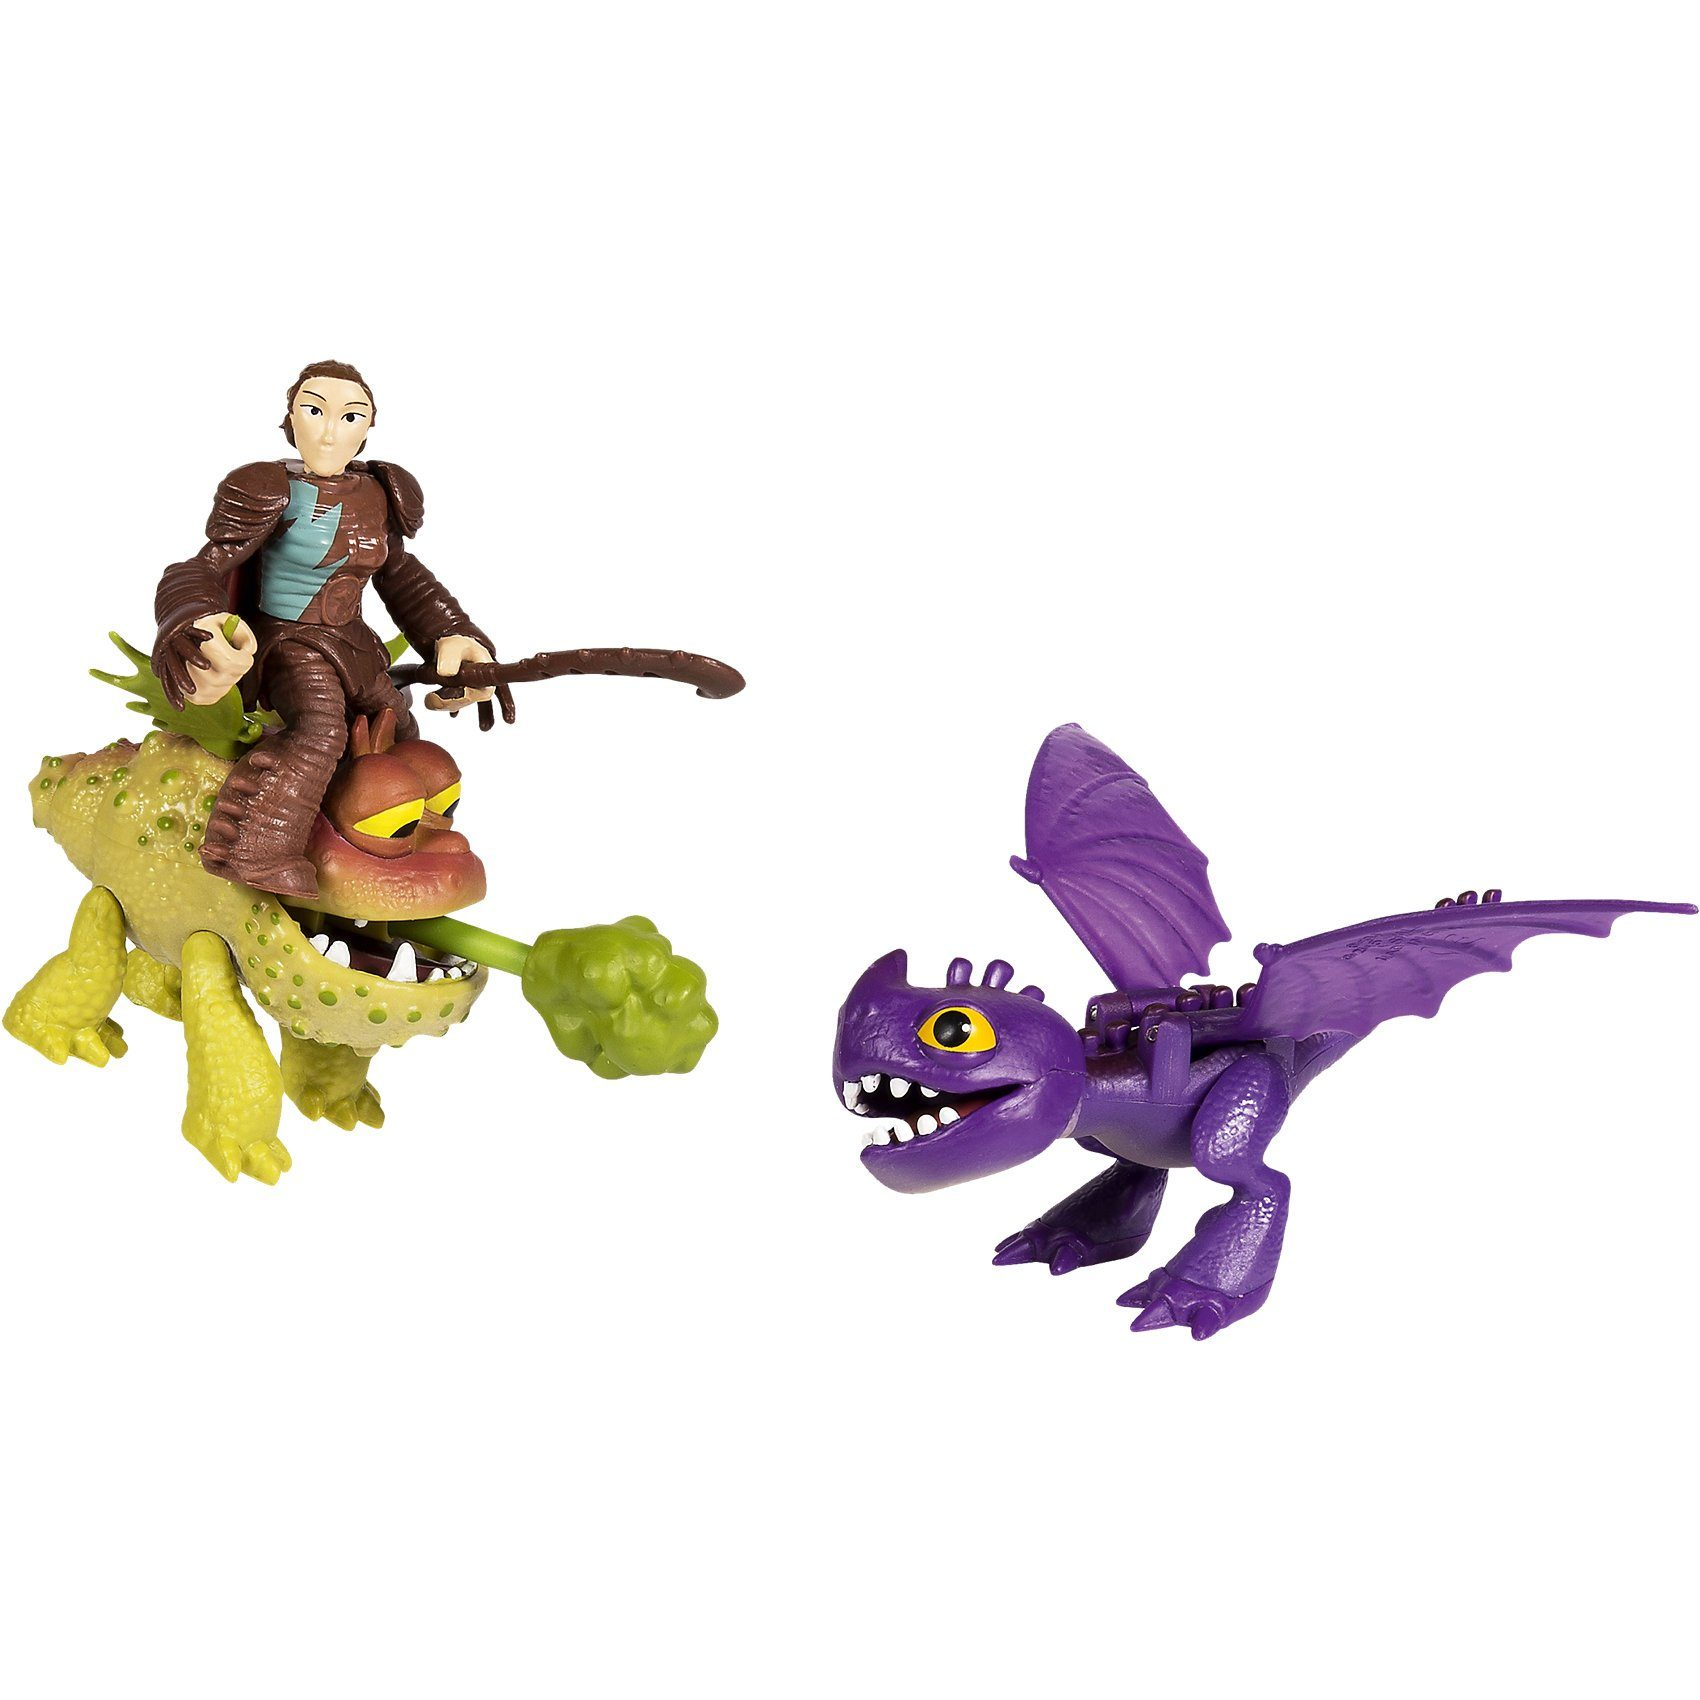 Spin Master Dragons - Dragon & Riders - Valka Baby Gronckel und Mini-Kra